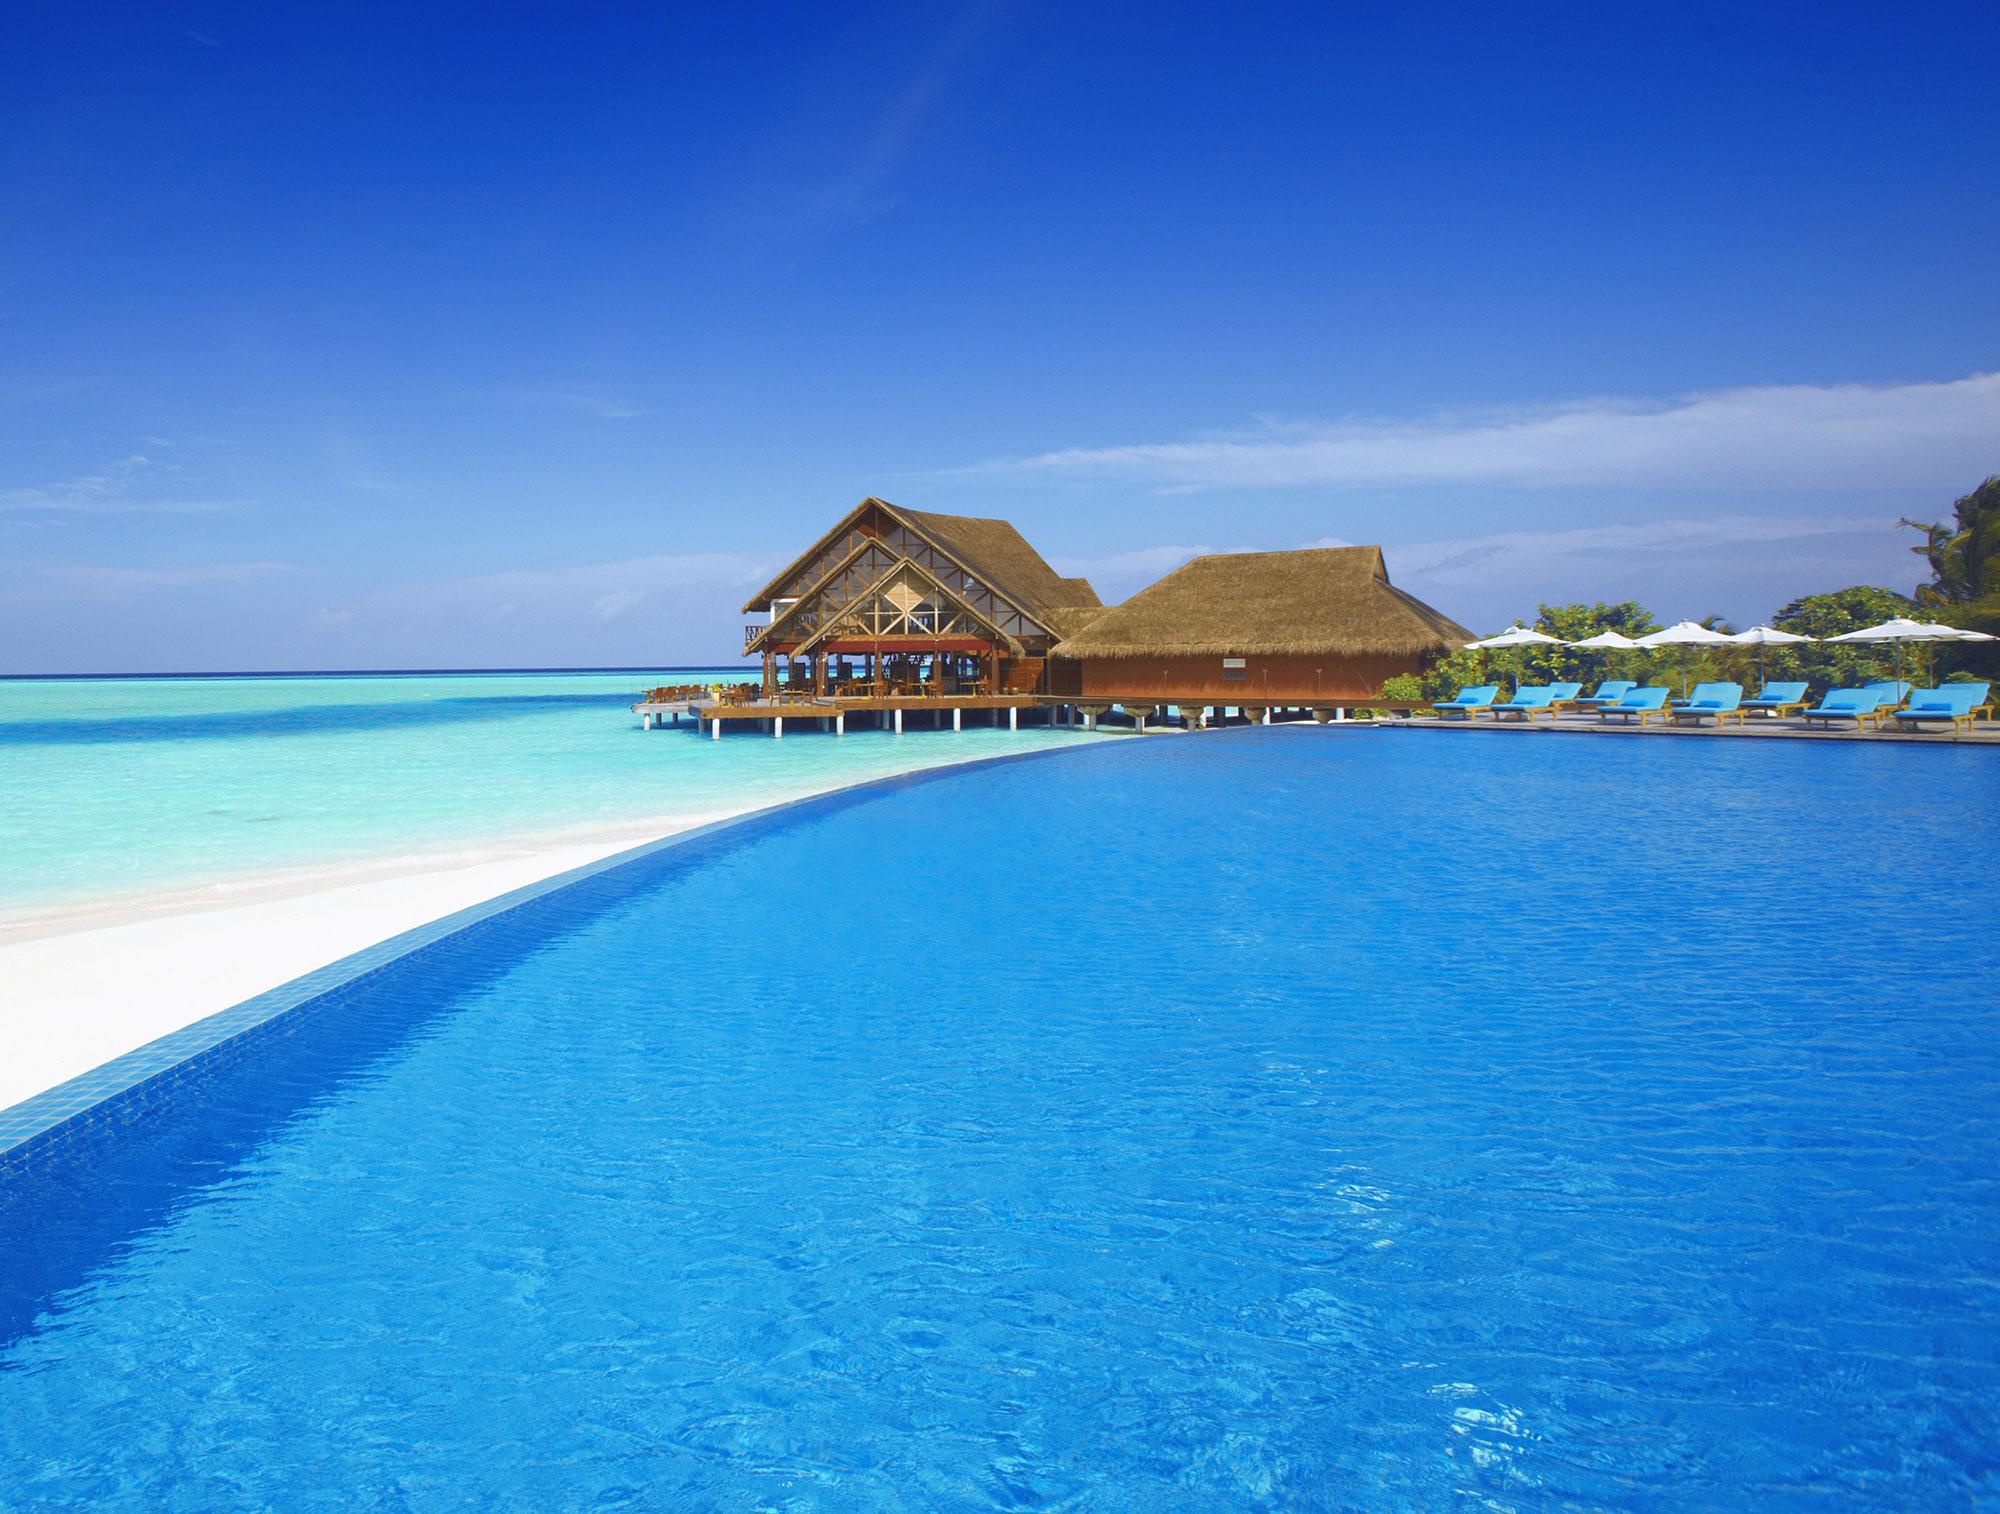 Anantara-Dhigu-Resort-01